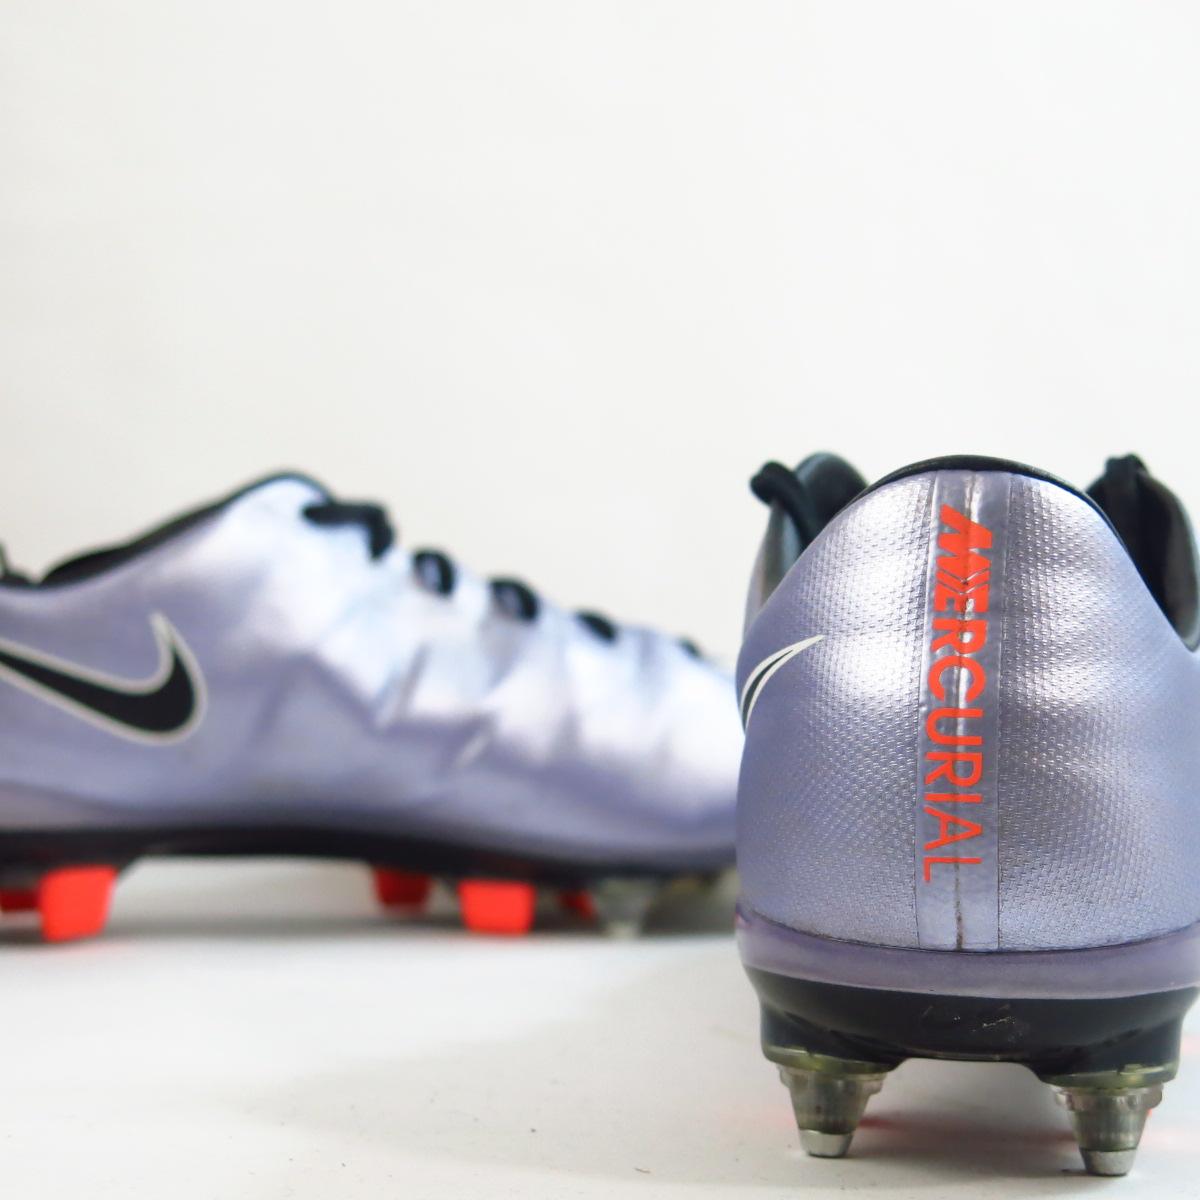 Chuteira Nike Mercurial Veloce SG-PRO Trava MIsta